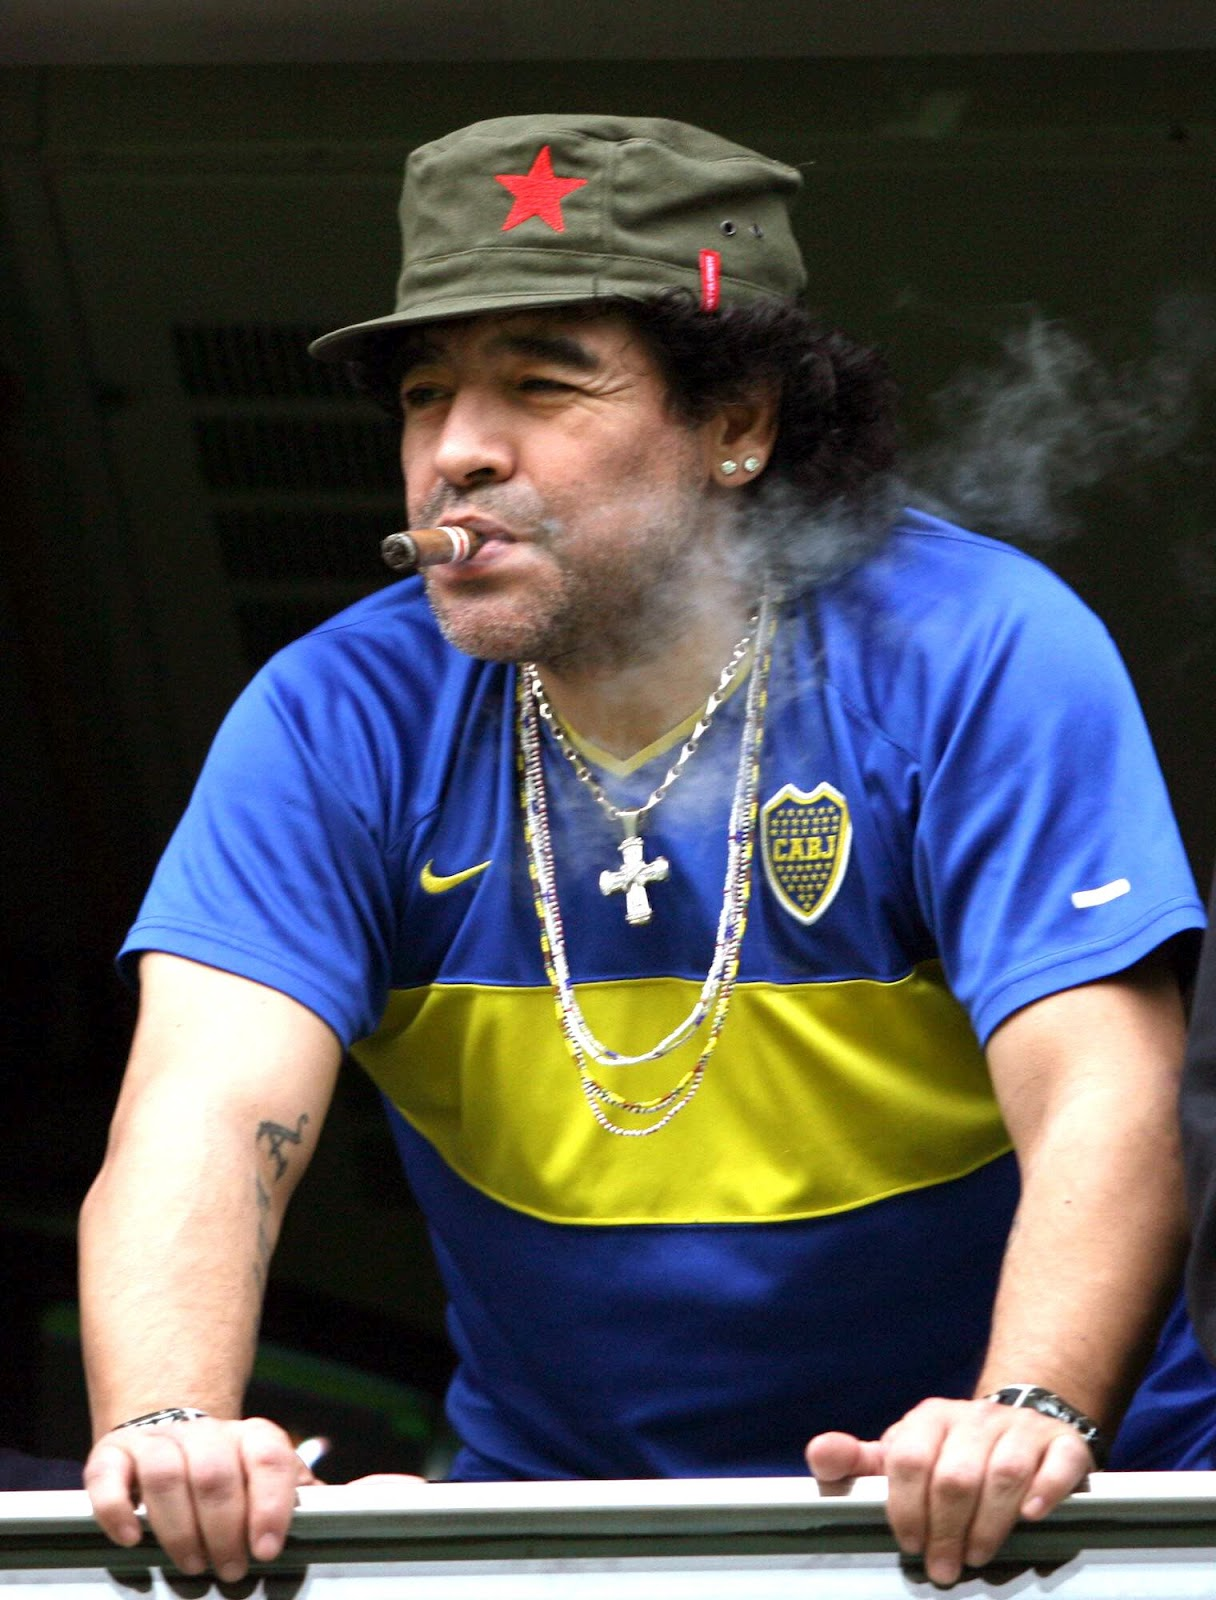 http://2.bp.blogspot.com/-LITVDHno39w/T5fUXIeDEGI/AAAAAAAABrE/Y5bgPAtV0xM/s1600/Maradona+image.jpg